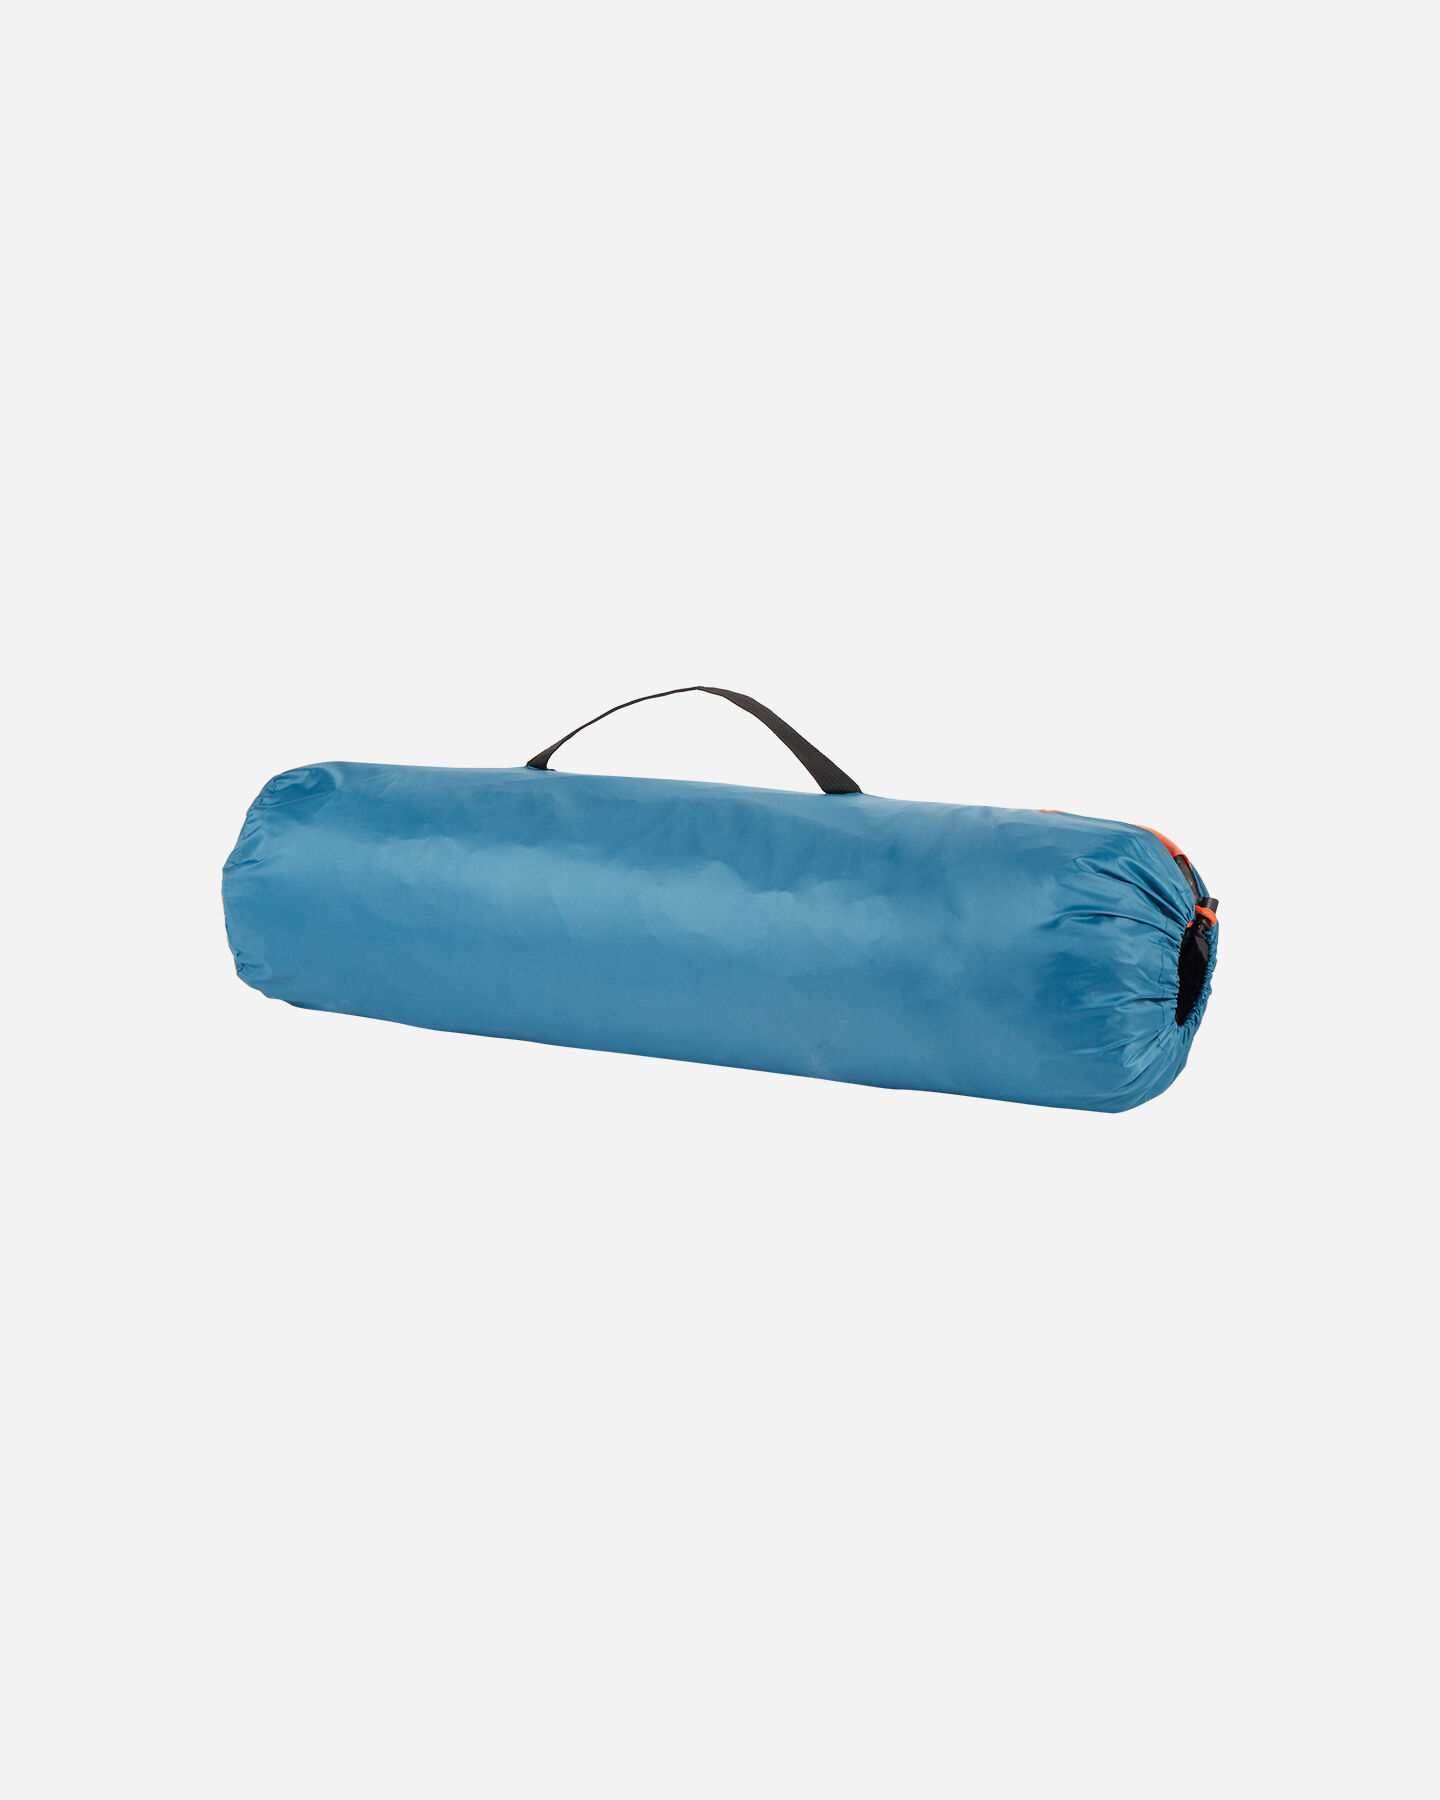 Tenda MCKINLEY VEGA 20.3 S2021938|900|- scatto 2